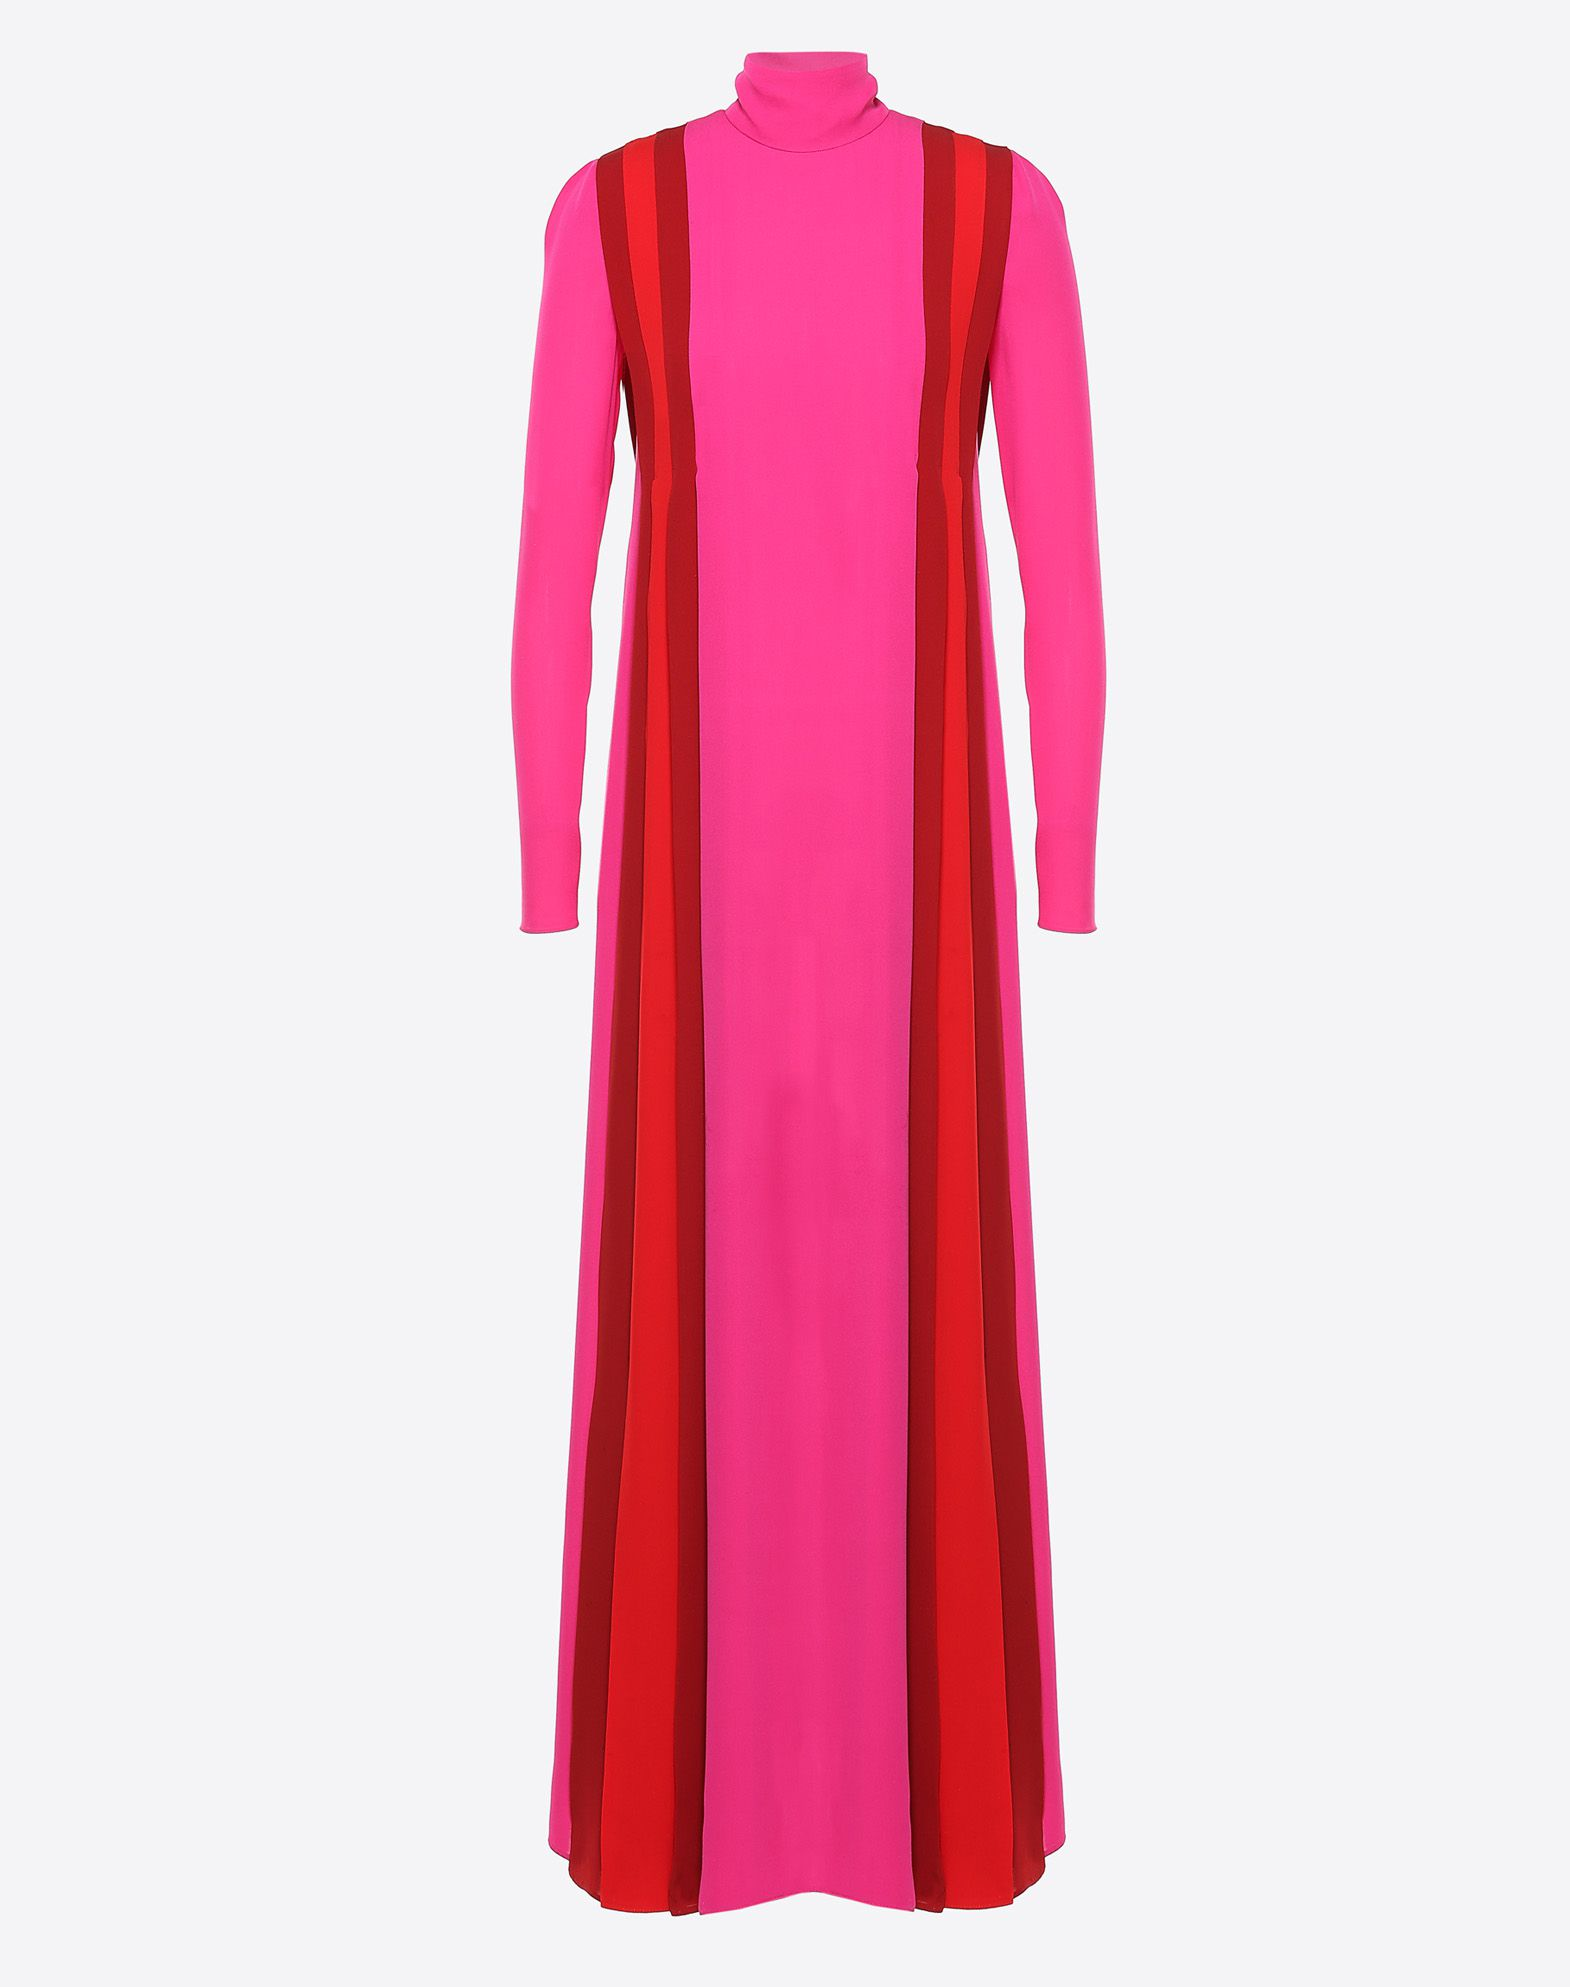 VALENTINO Crêpe Turtleneck Rear zip closure Internal slip dress Pleated detailing Long sleeves  34722490sd